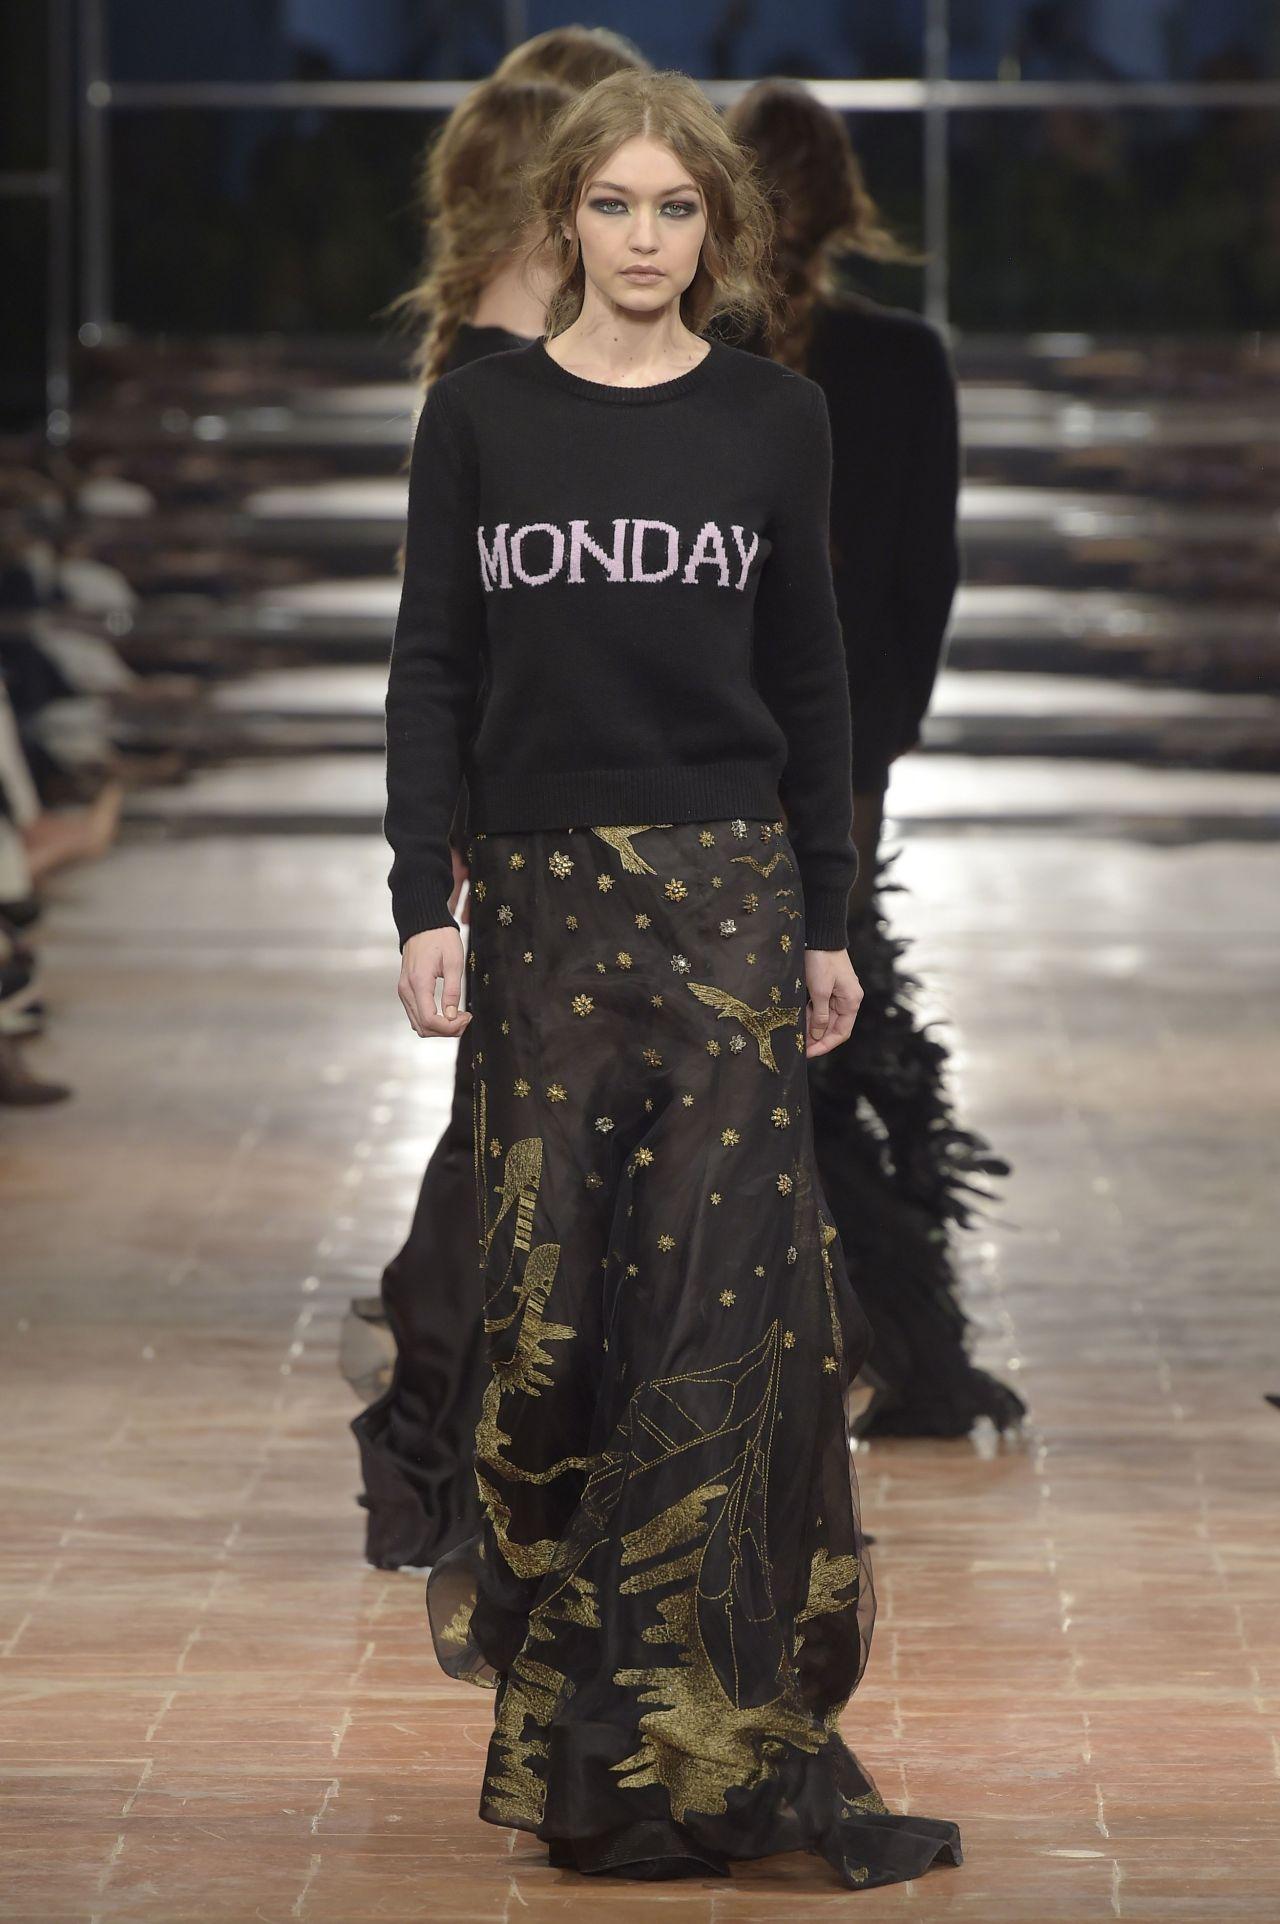 Gigi Hadid Supermodel Runway Walk At Milan Fashion Week